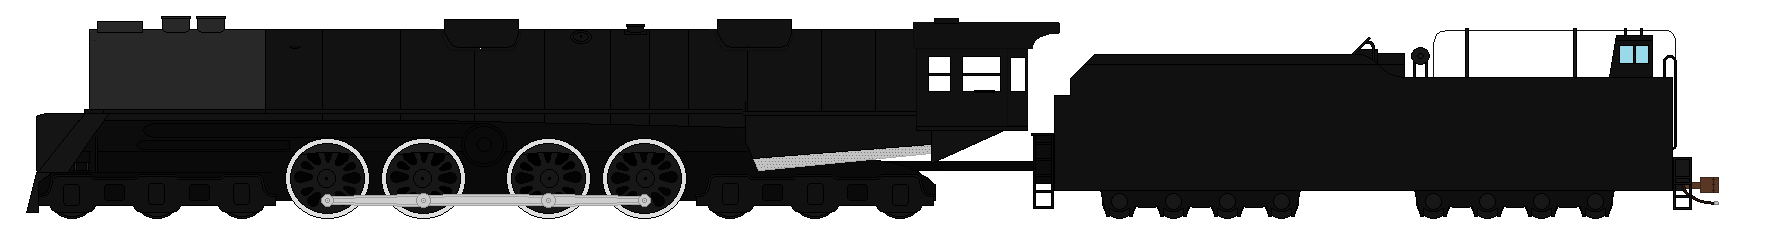 Hokkaido Steam Turbine locomotive by SenkanYamato